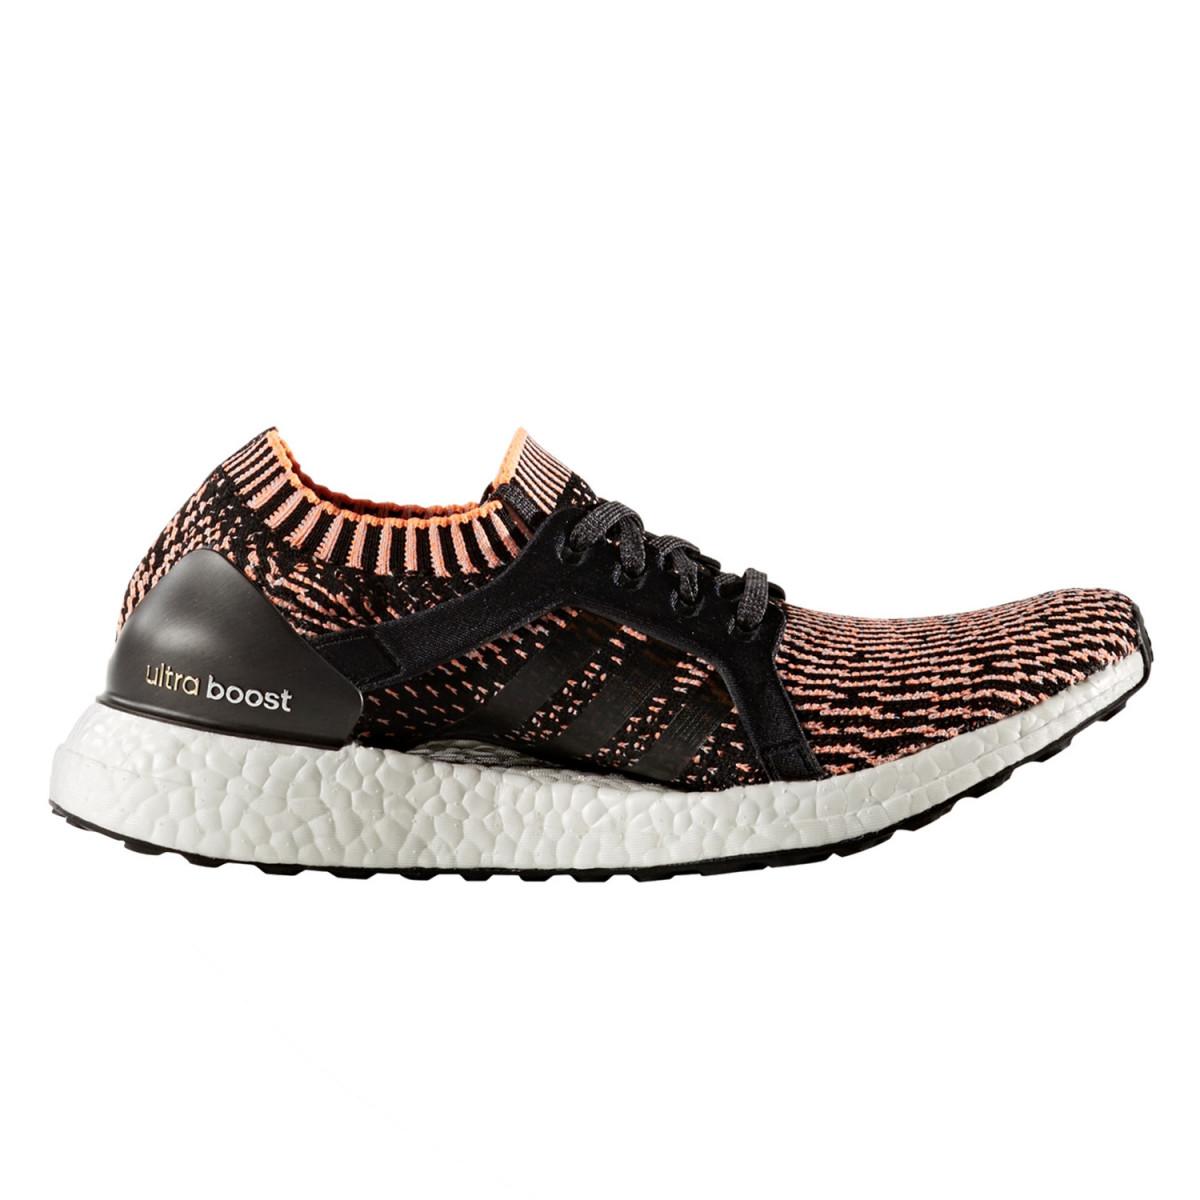 Zapatillas Adidas Ultraboost X